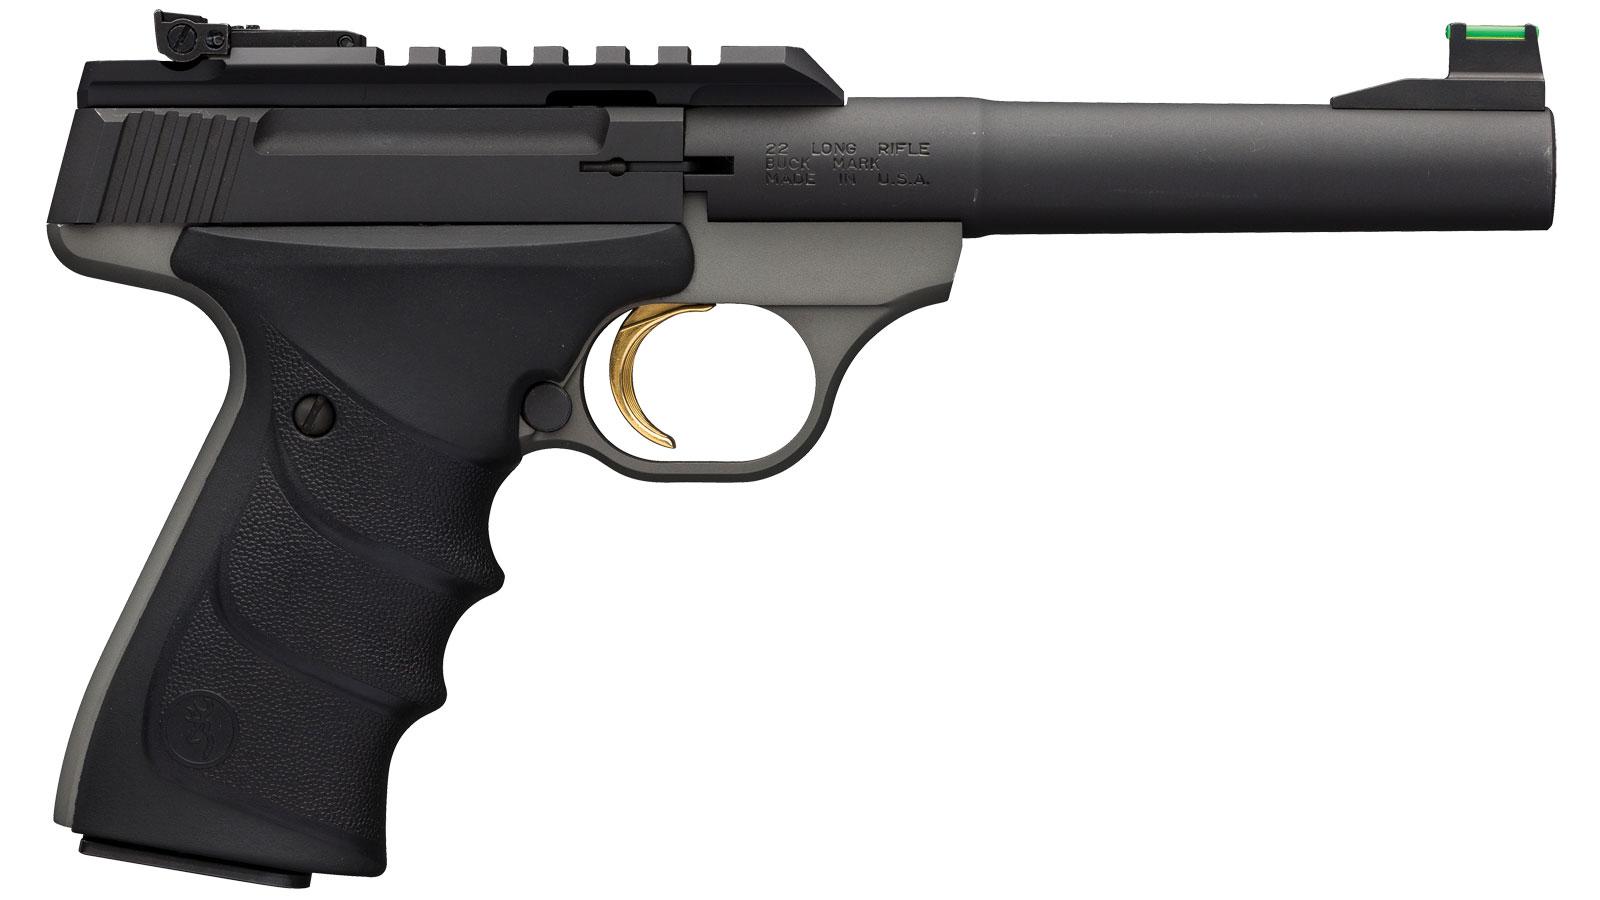 Browning 051530490 Buck Mark Plus Practical 22 Long Rifle (LR) Single 5.5 10+1 Black Ultragrip RX Grip Gray Aluminum Alloy Frame Black Aluminum Alloy Slide in.